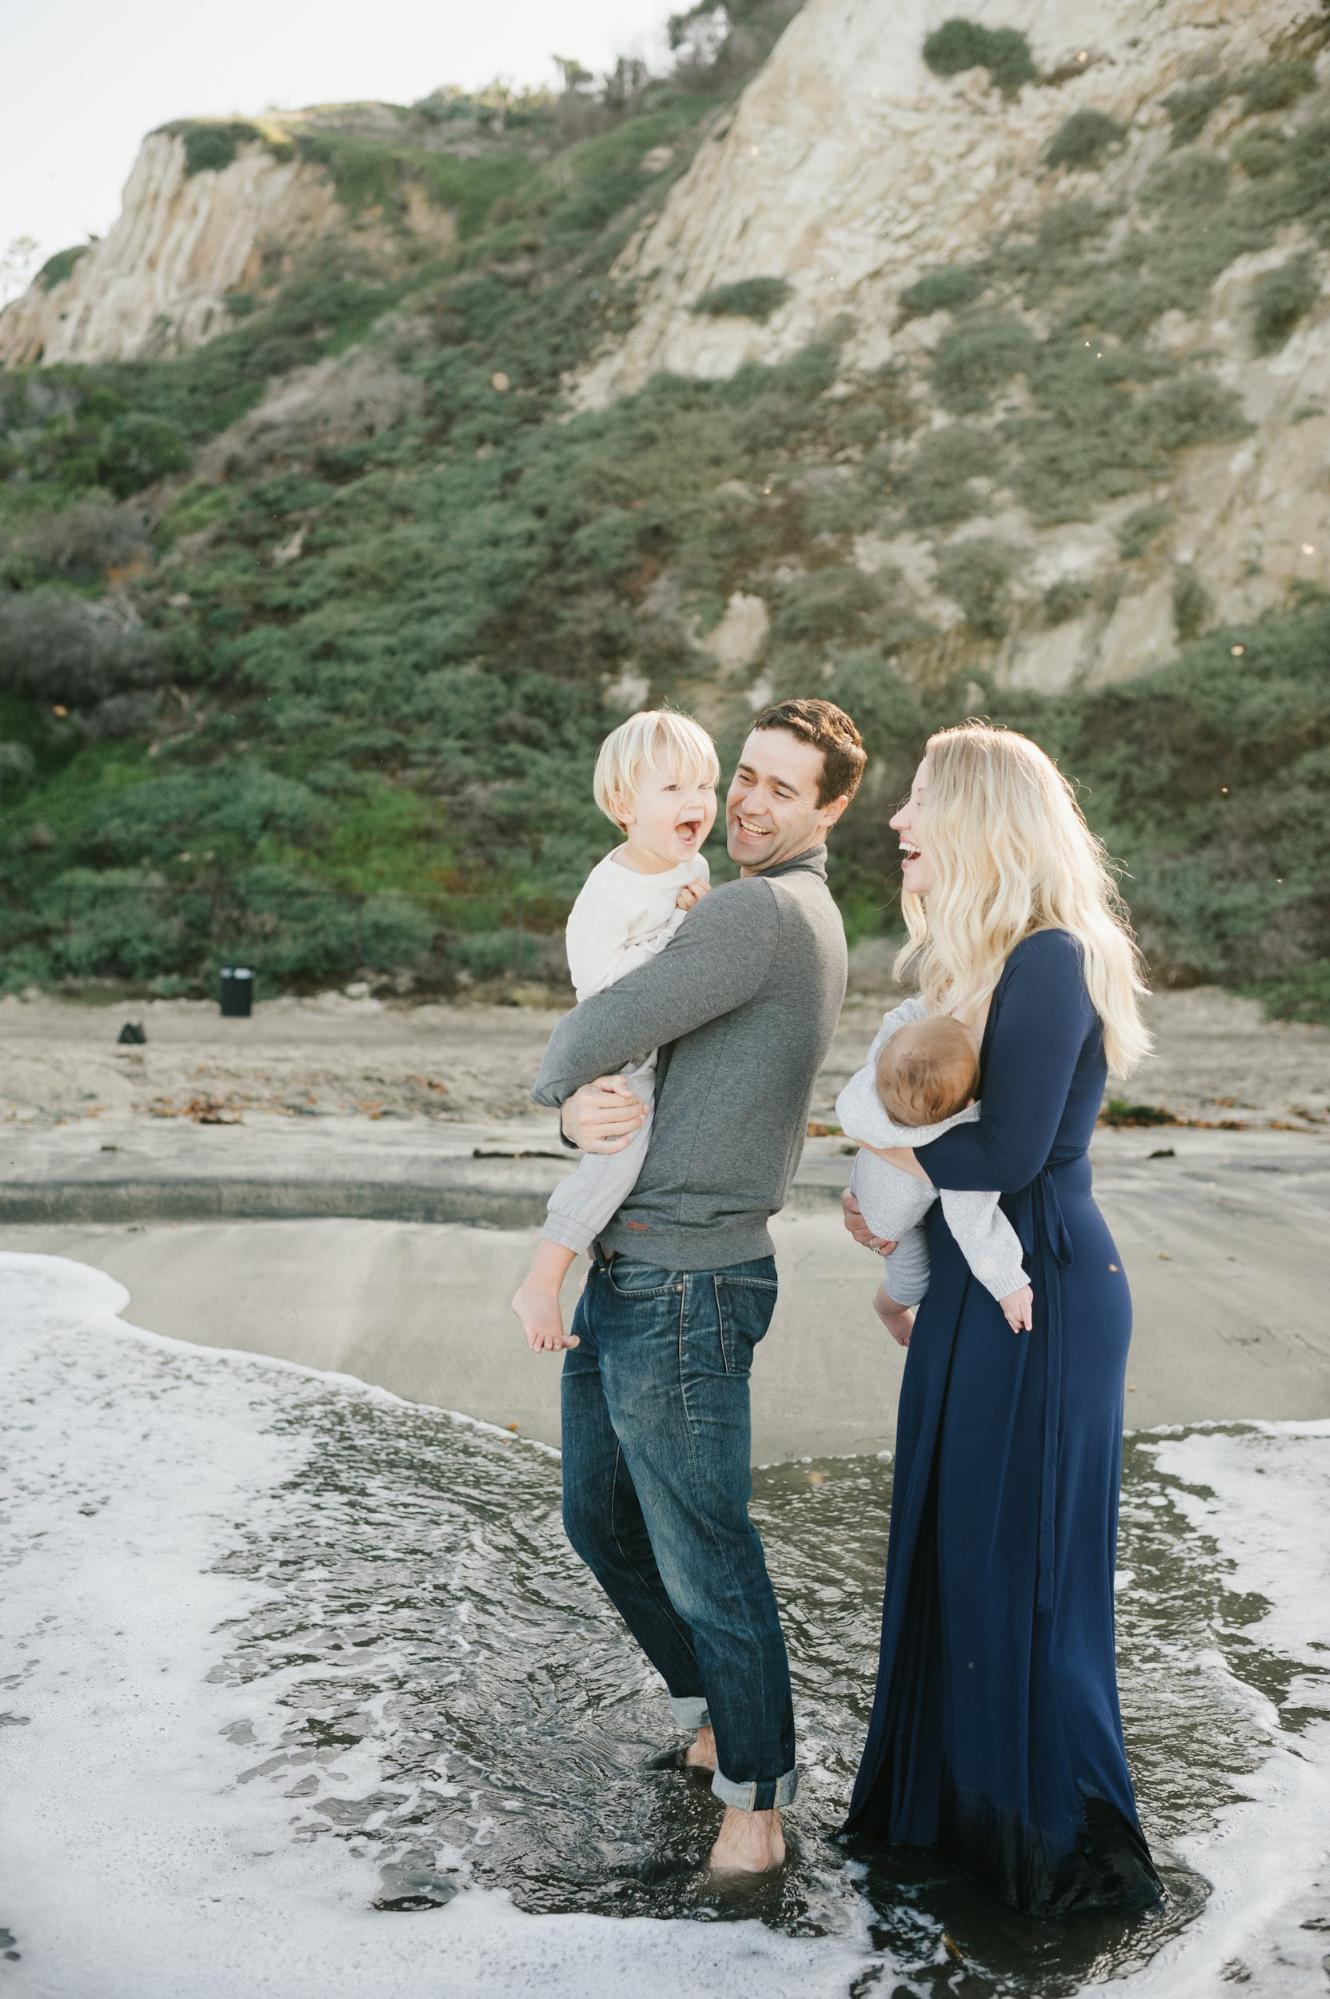 Hawlie and her family in Manhattan Beach, California